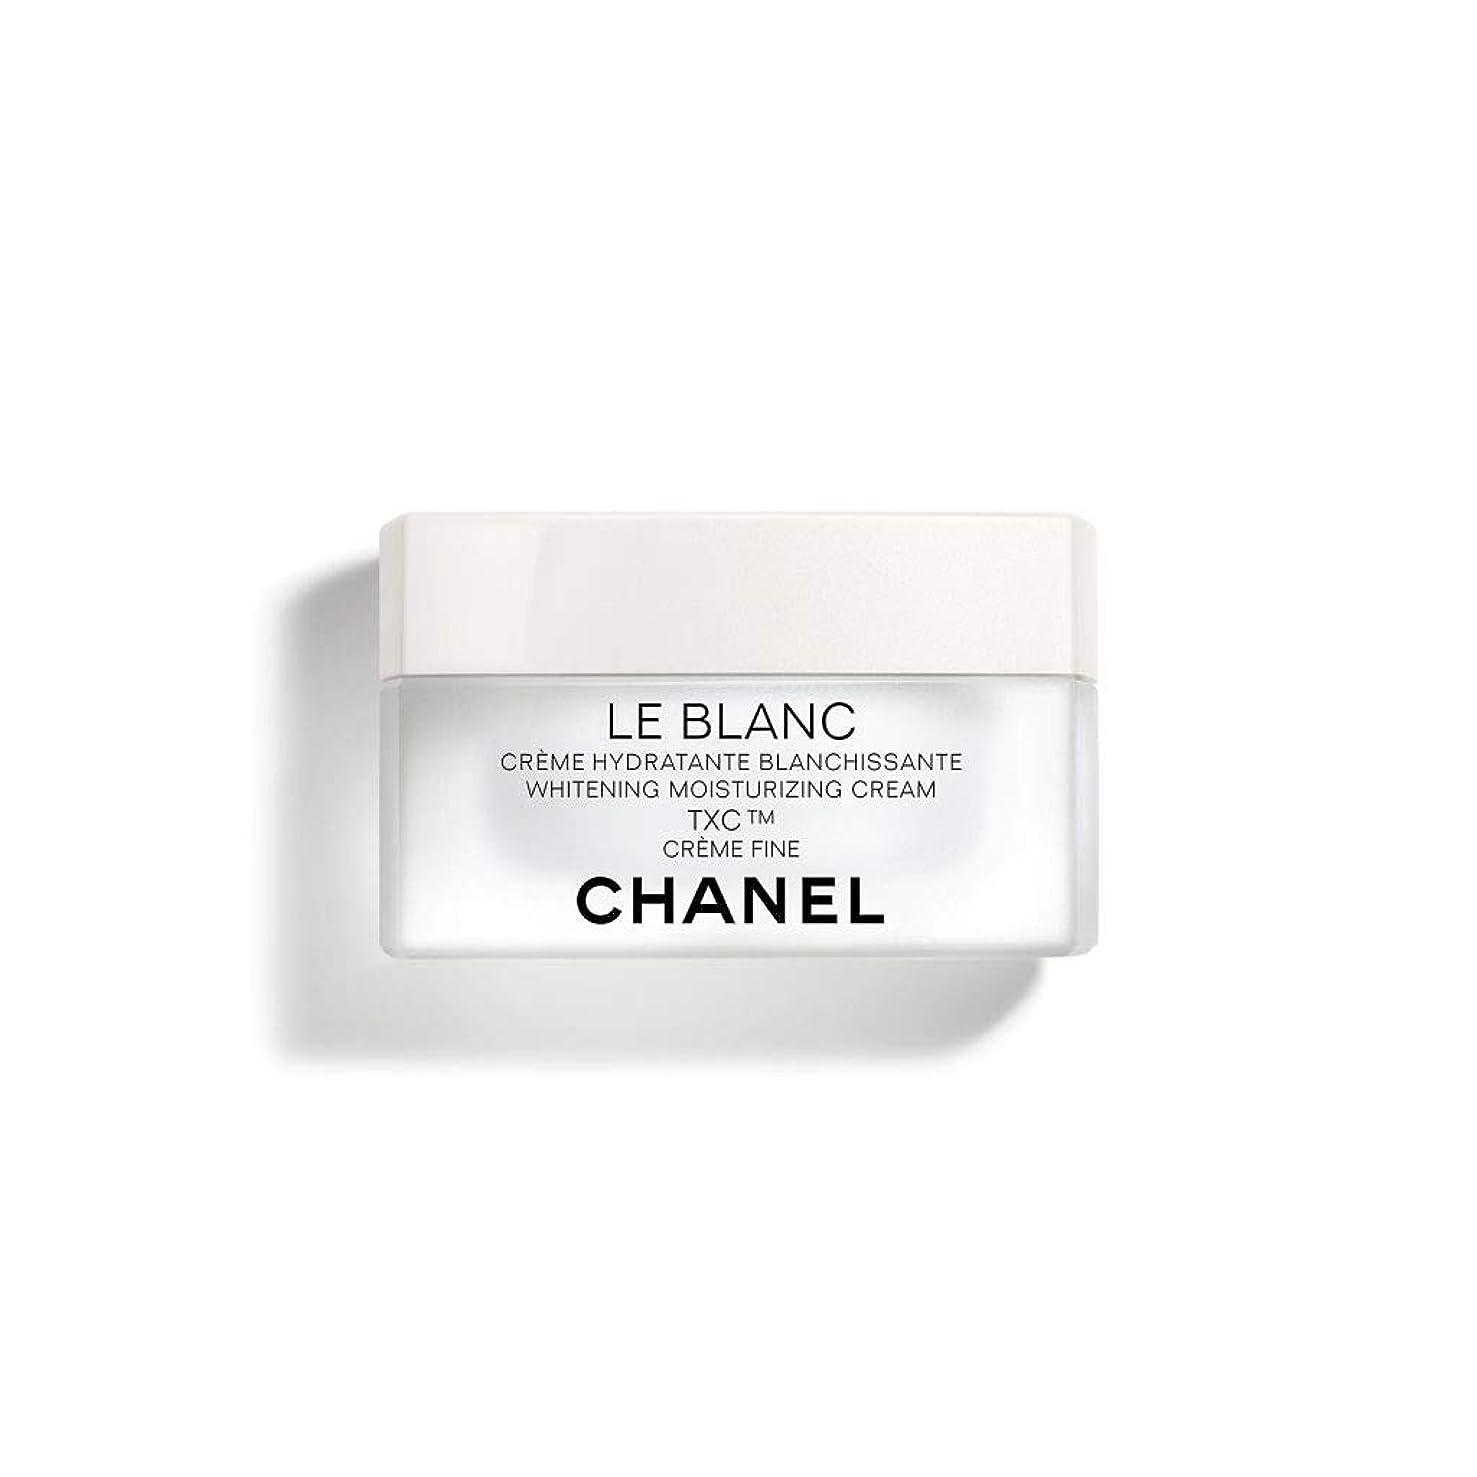 LE BLANC WHITENING MOISTURIZING CREAM TXC - CREME FINE 50G.